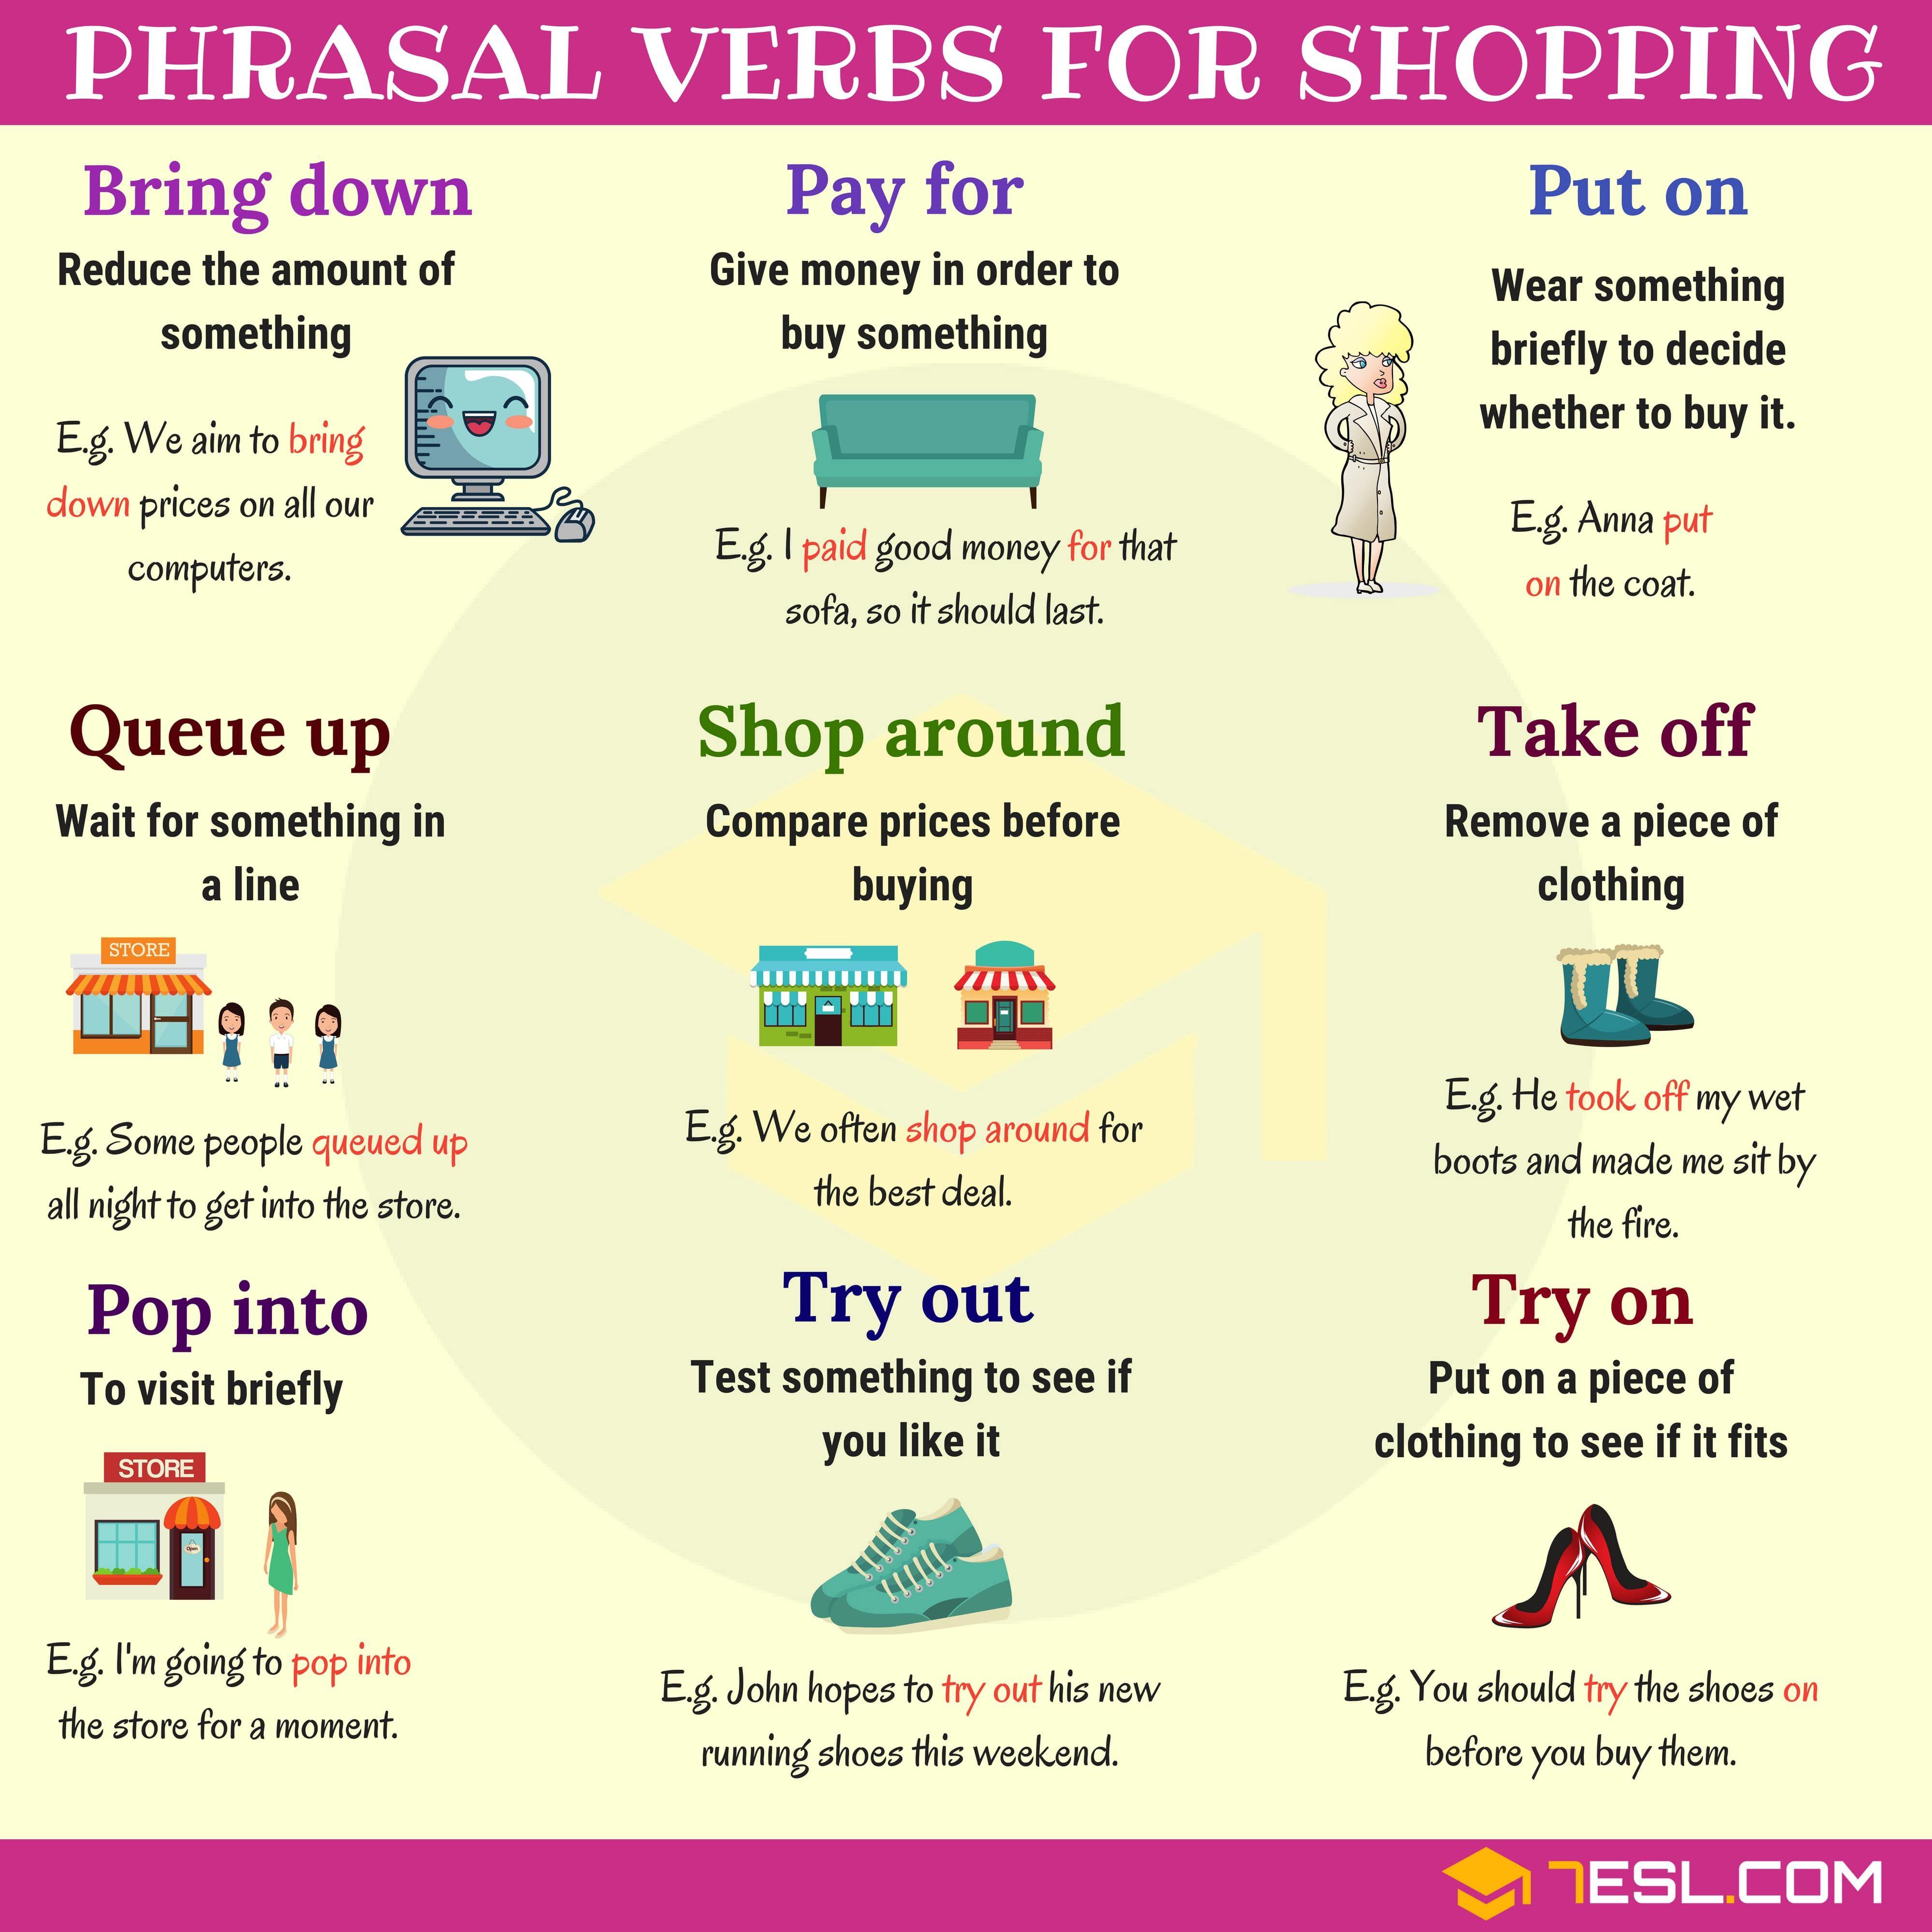 Shopping vocabulary 19 useful phrasal verbs for shopping